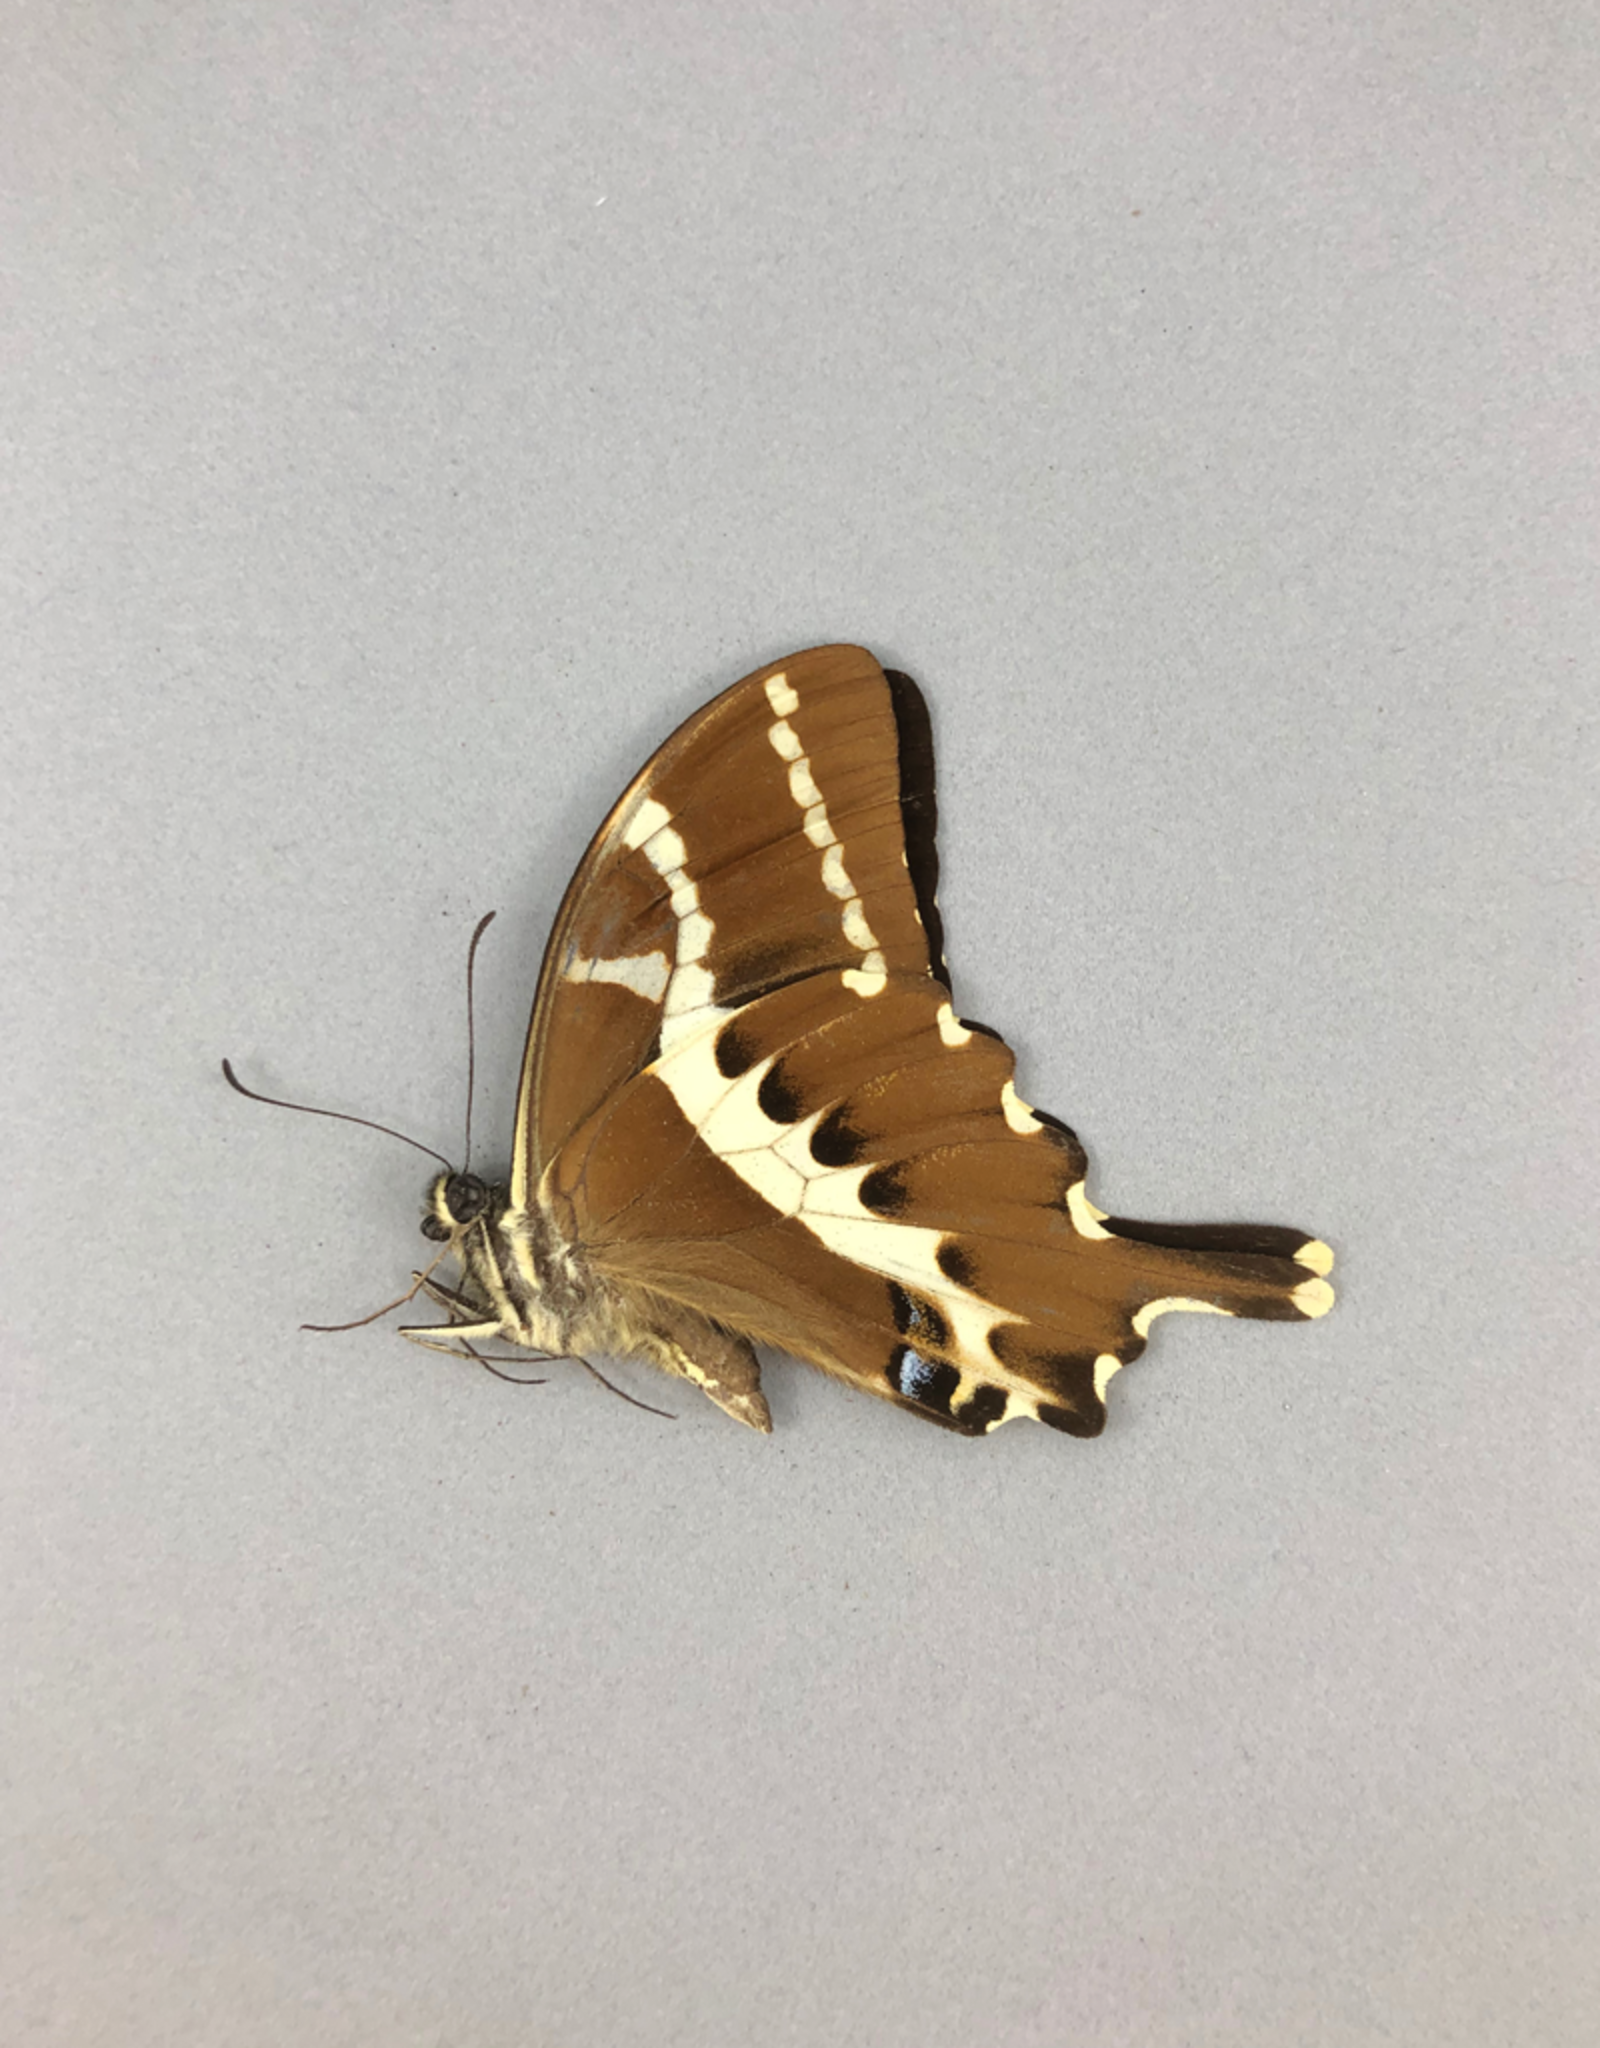 Papilio delalandei M A1 Madagascar